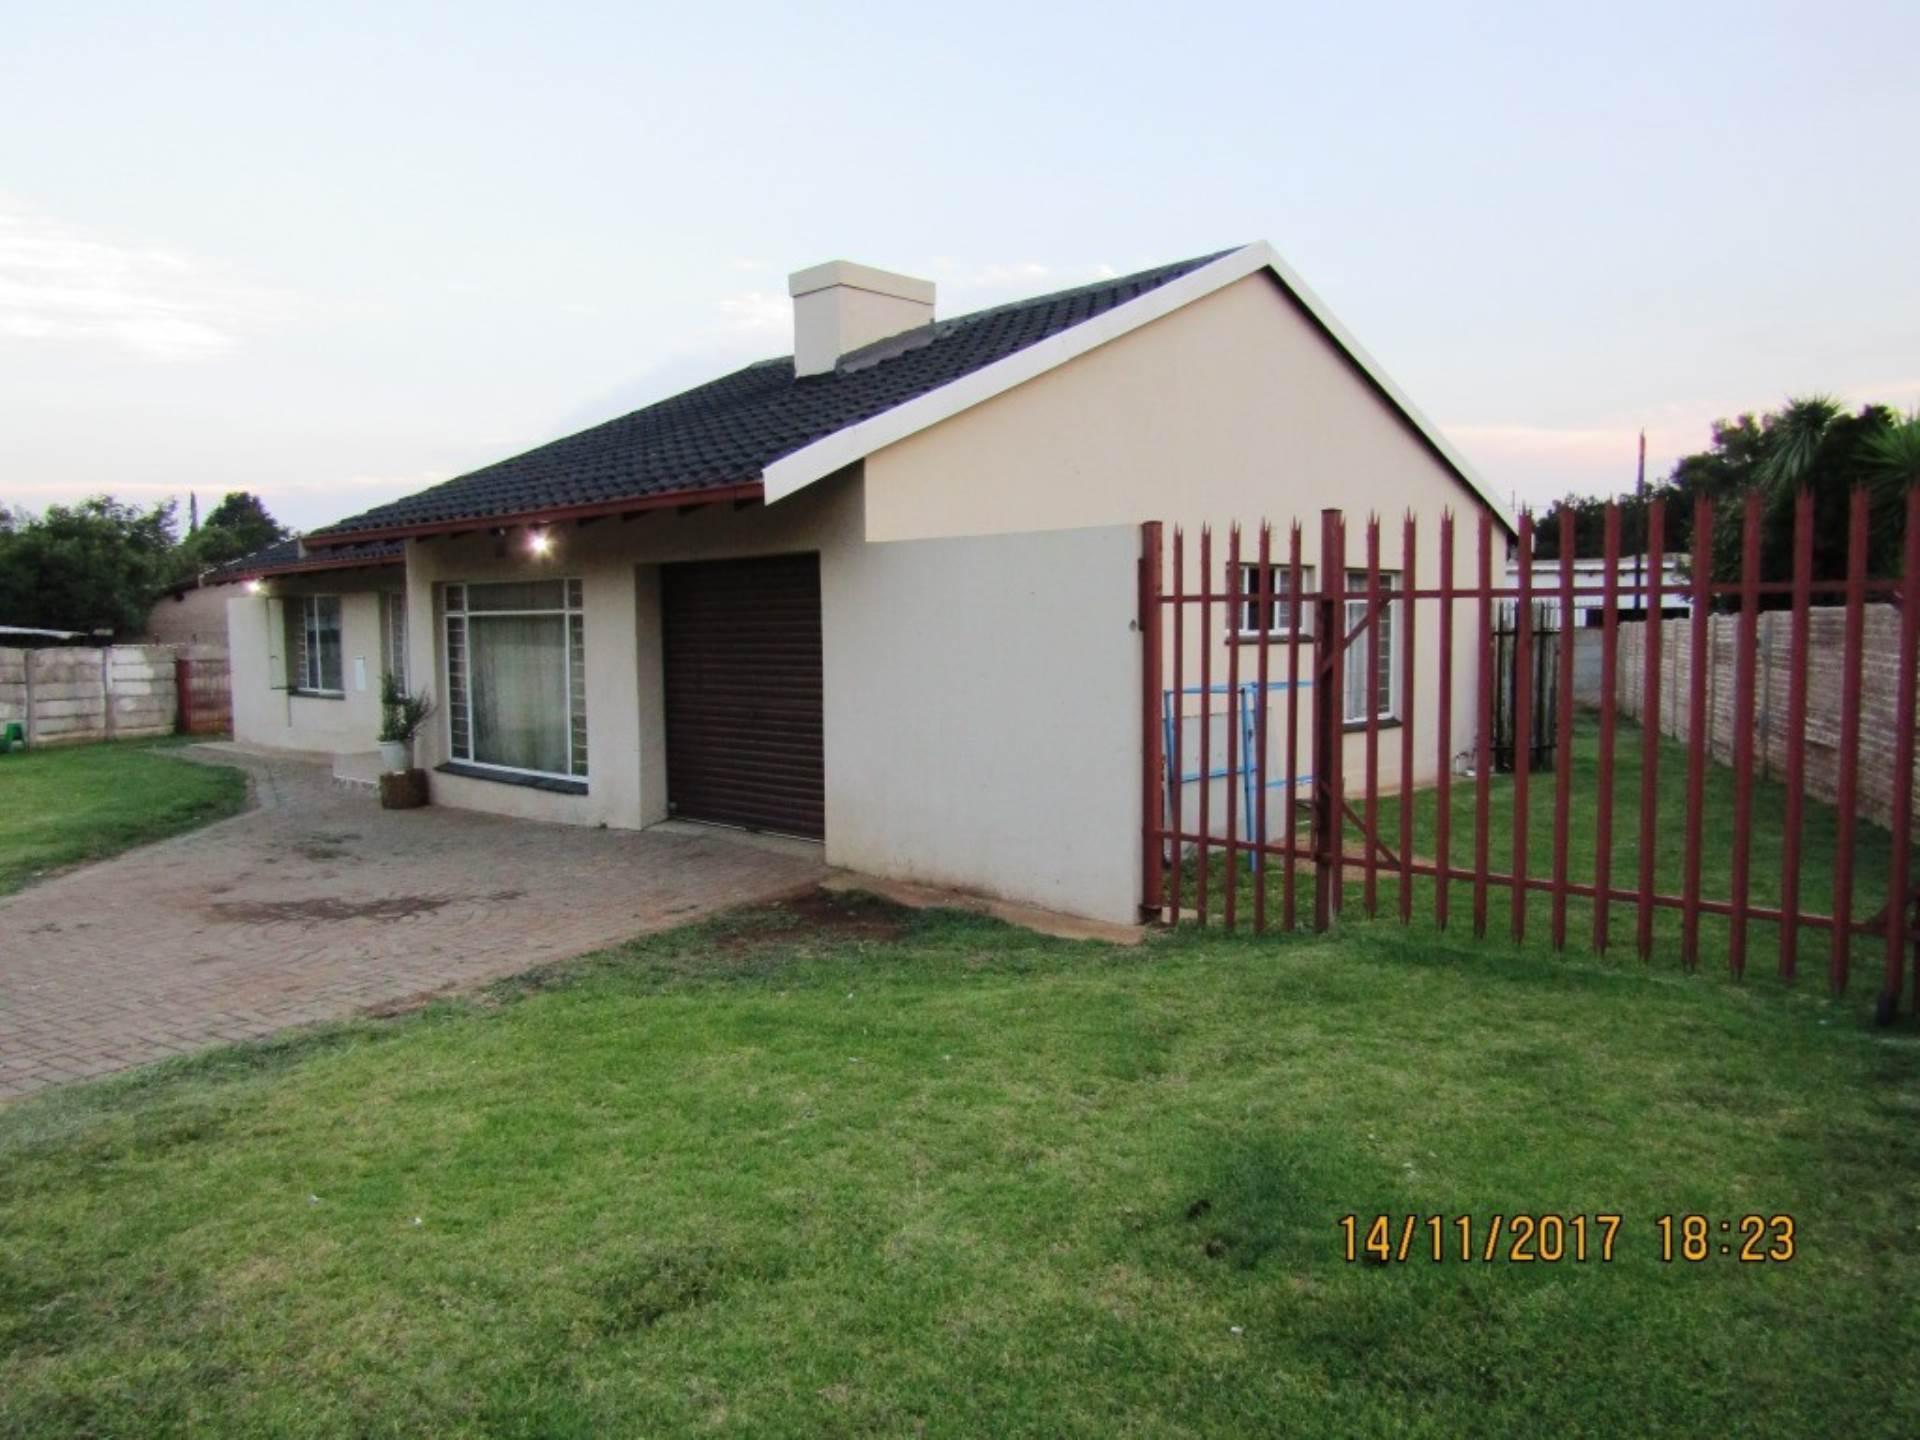 3 BedroomHouse For Sale In Dersley